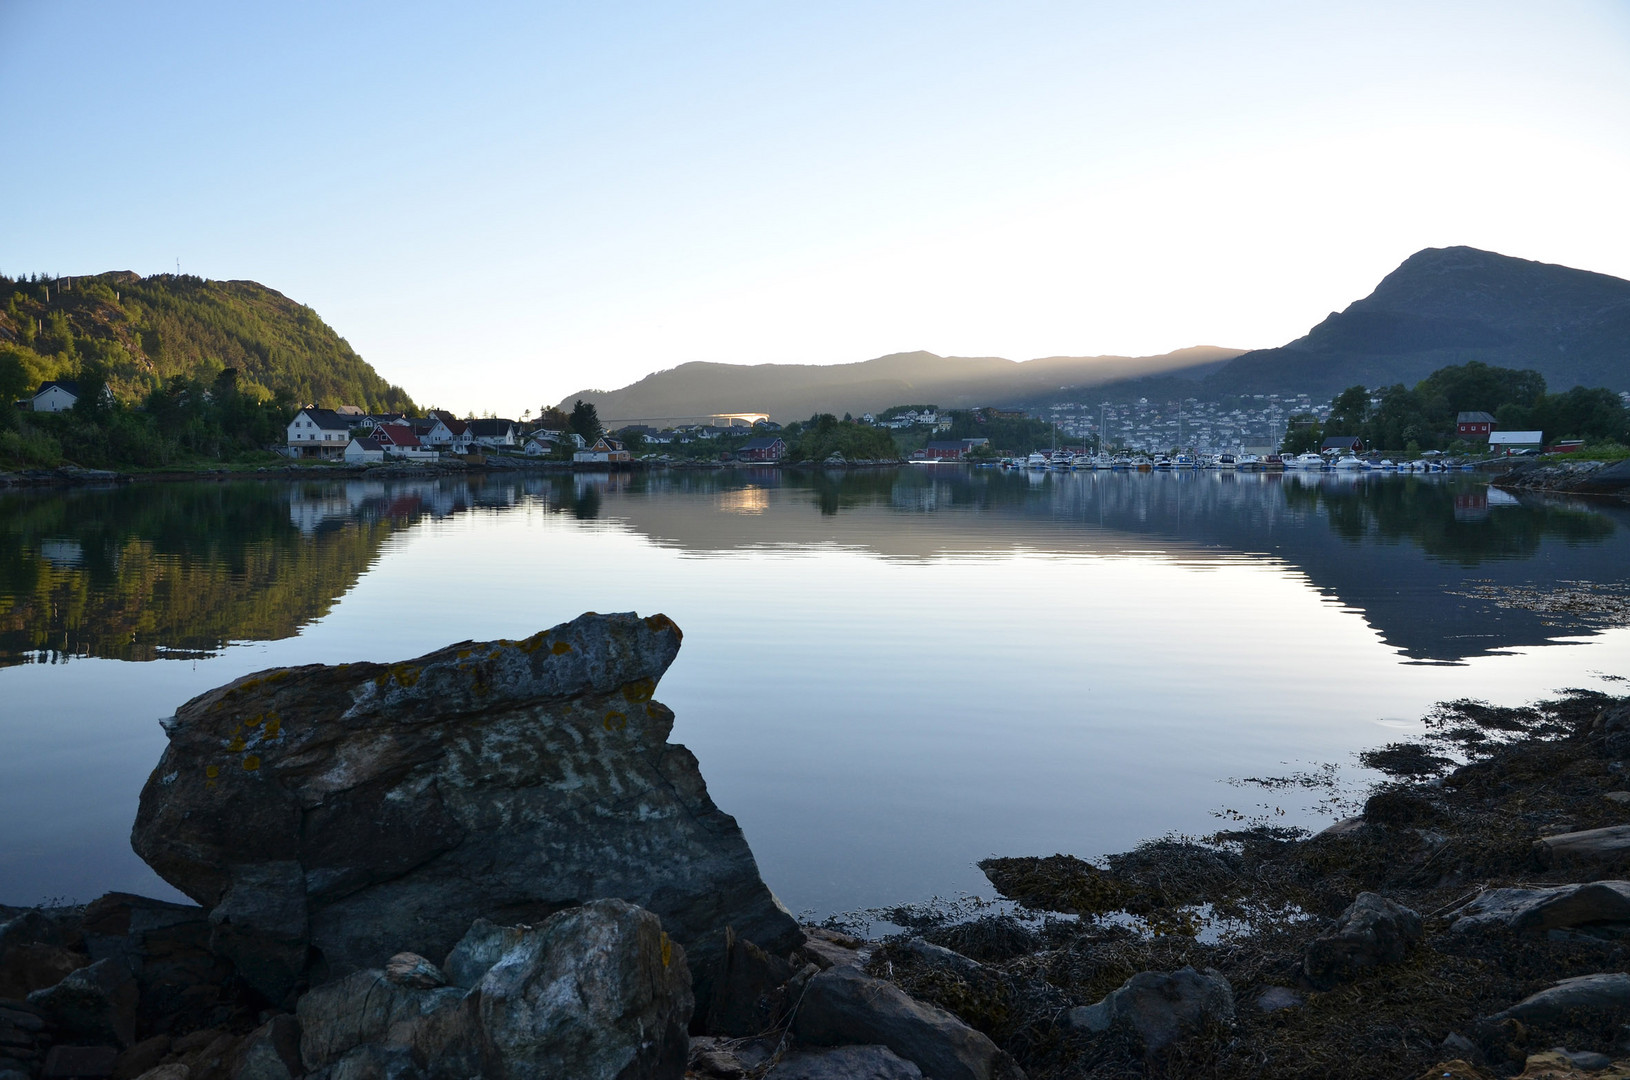 Insel Malöy, Norway – 2013